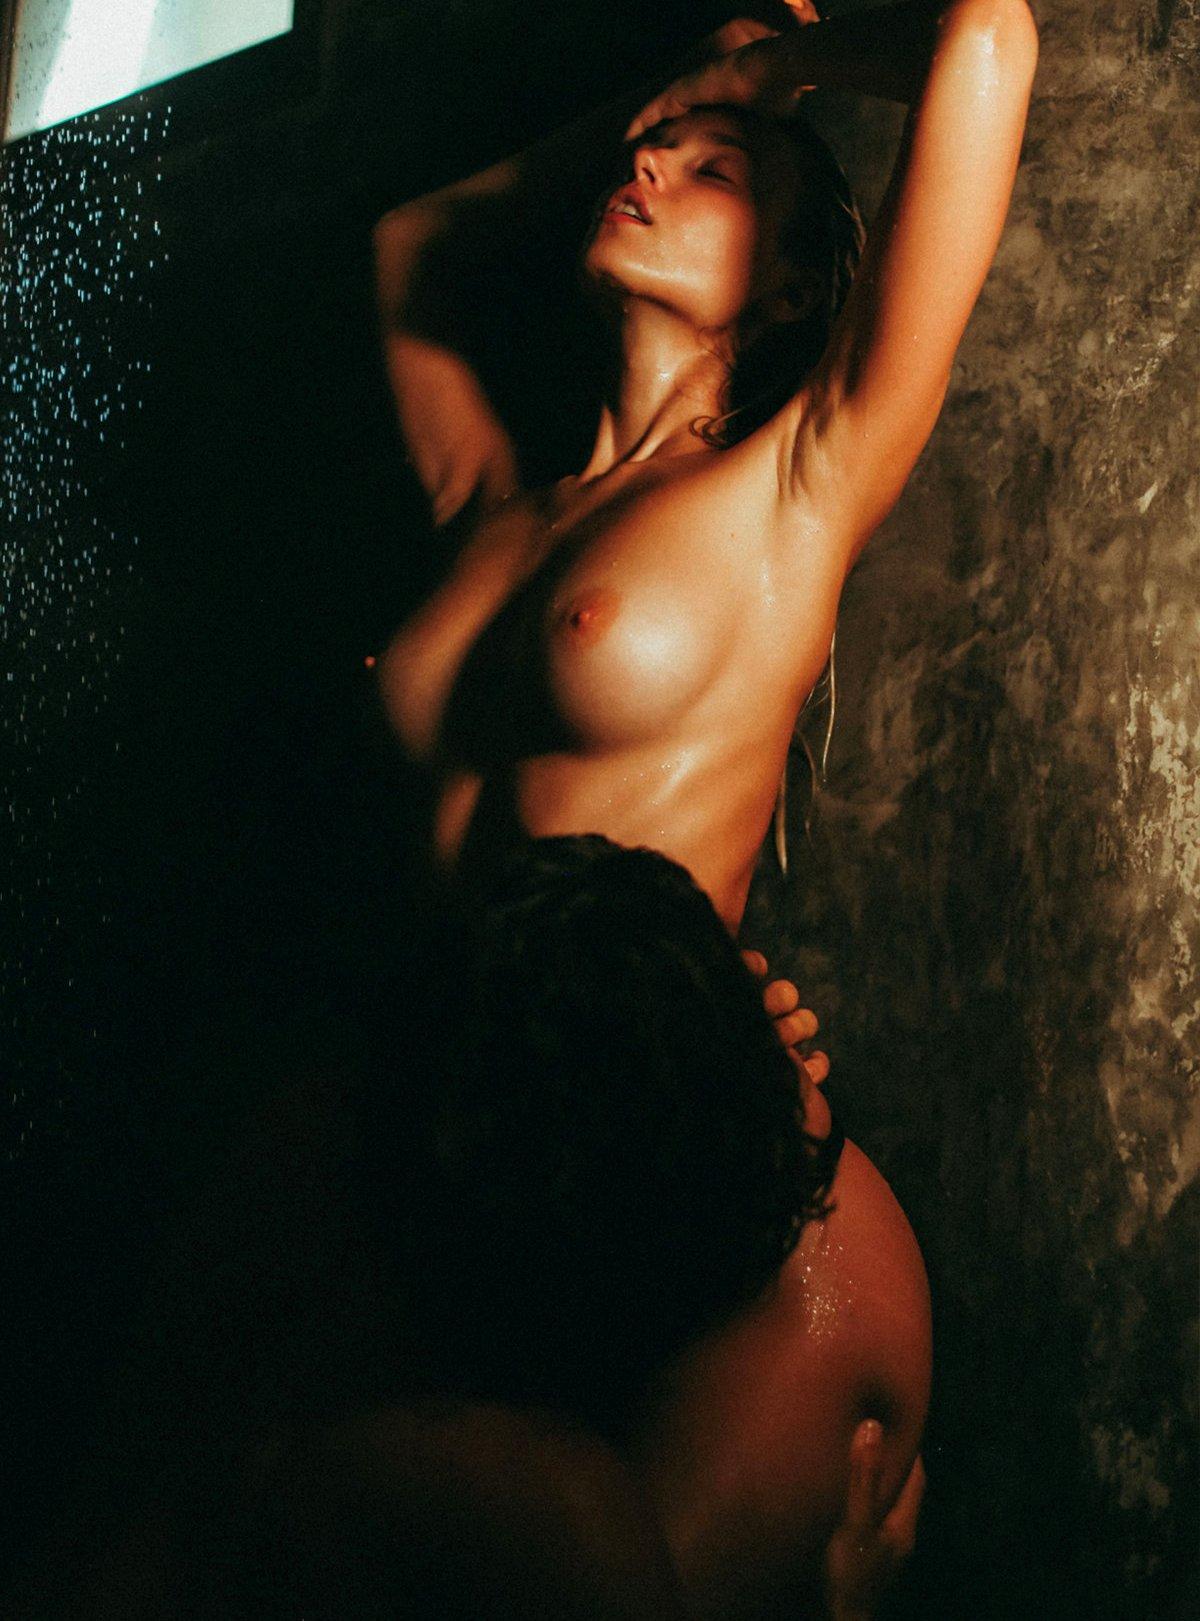 Polina Malinovskaya Polinamalinovskaya Instagram Nude Leaks 0005